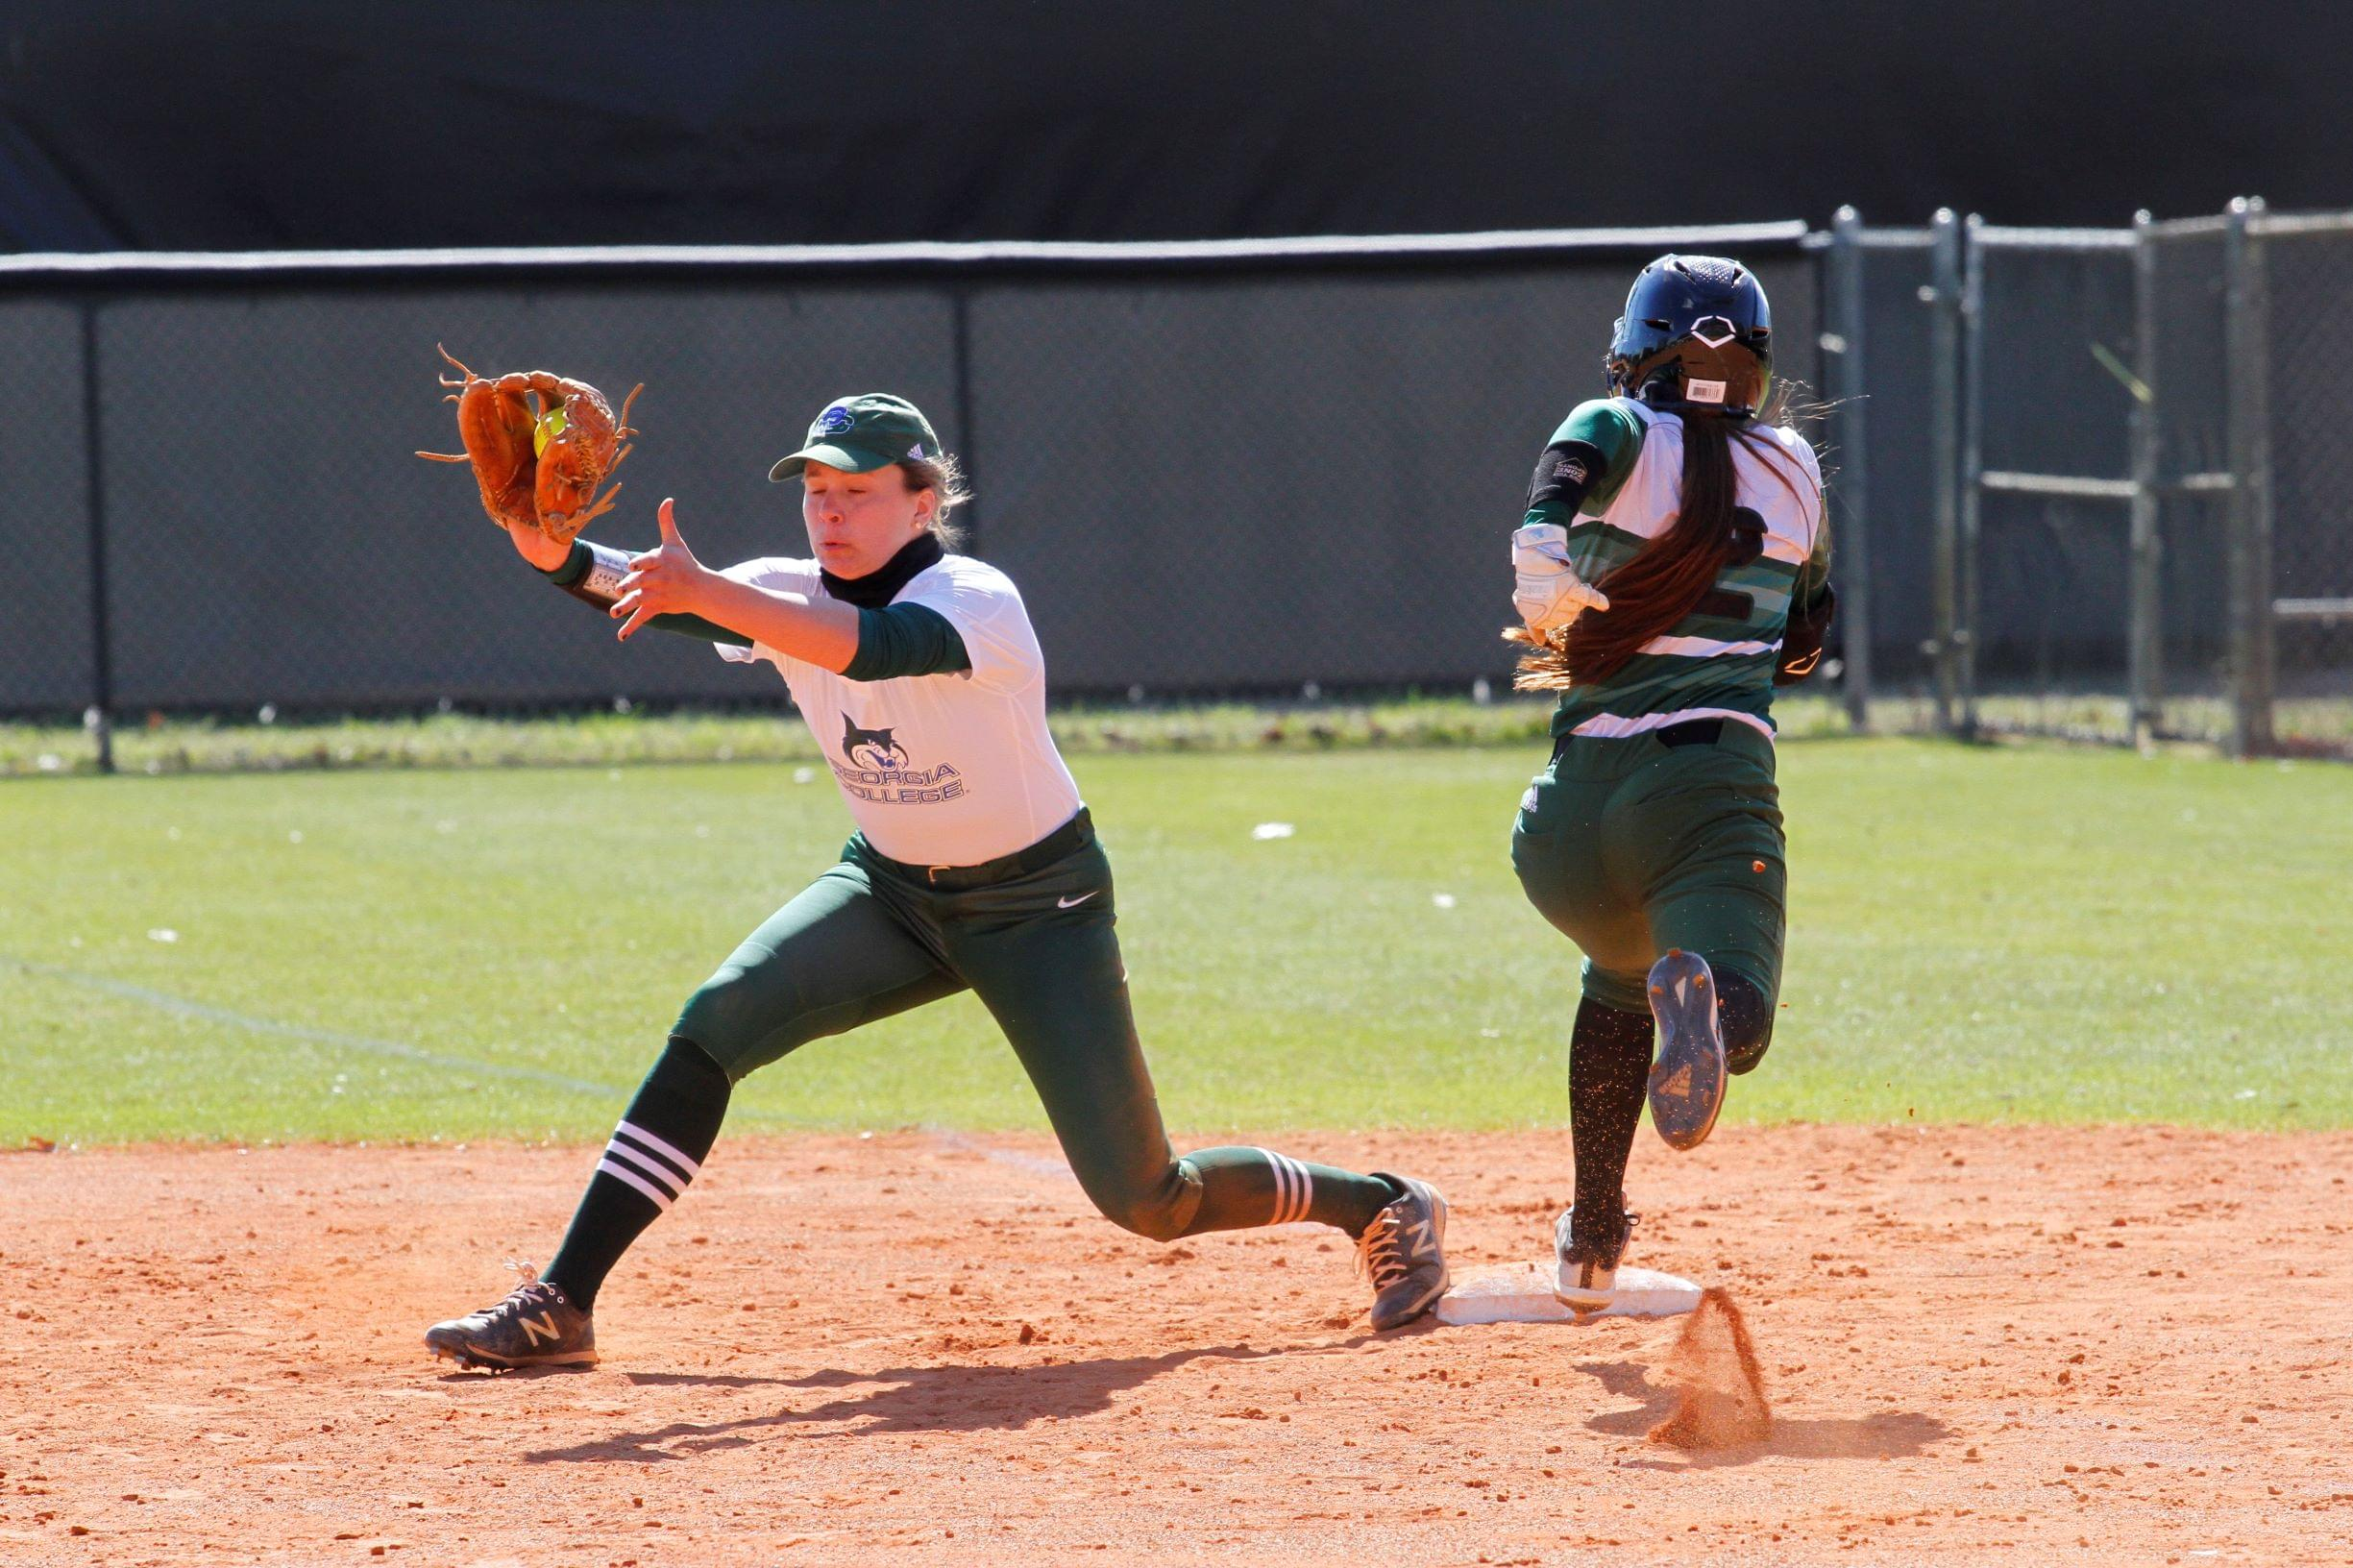 Softball: Georgia College At UMO (PHOTO GALLERY)